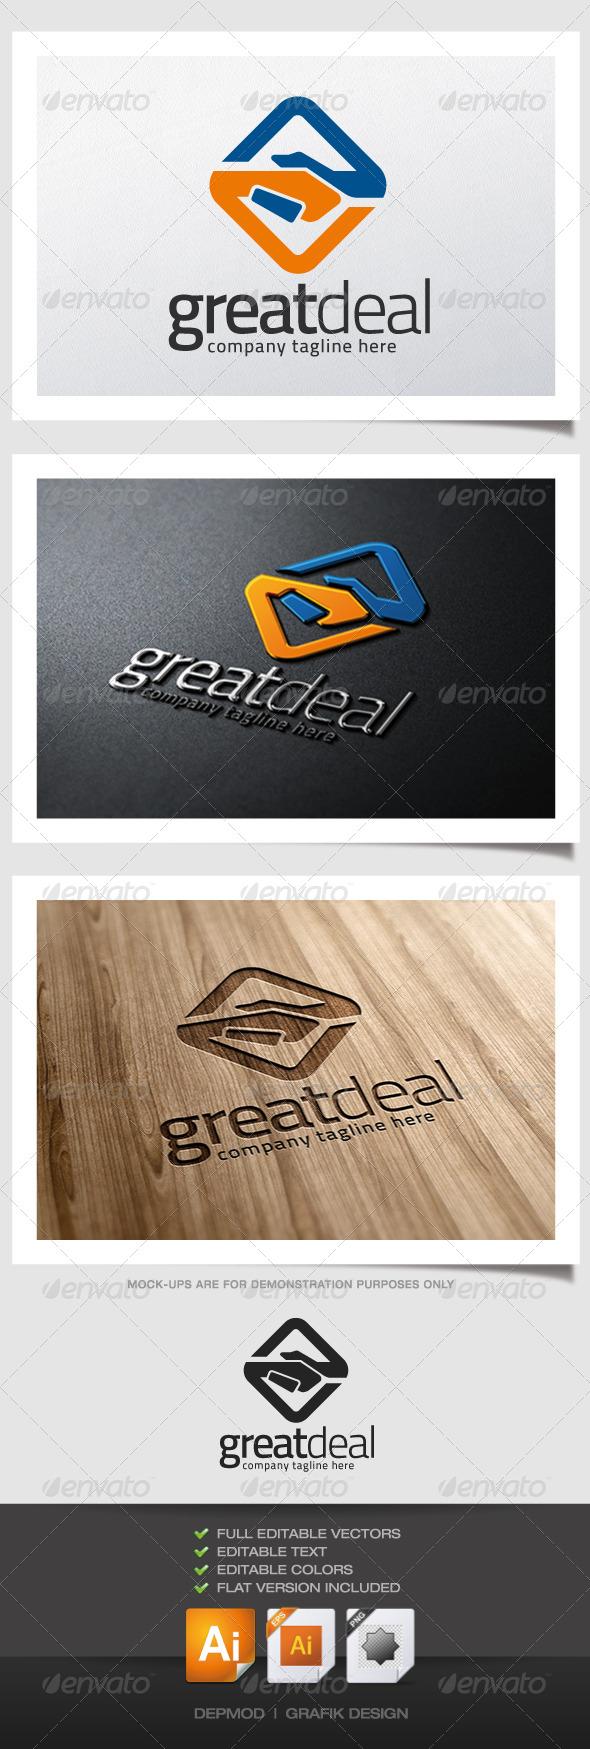 Great Deal Logo